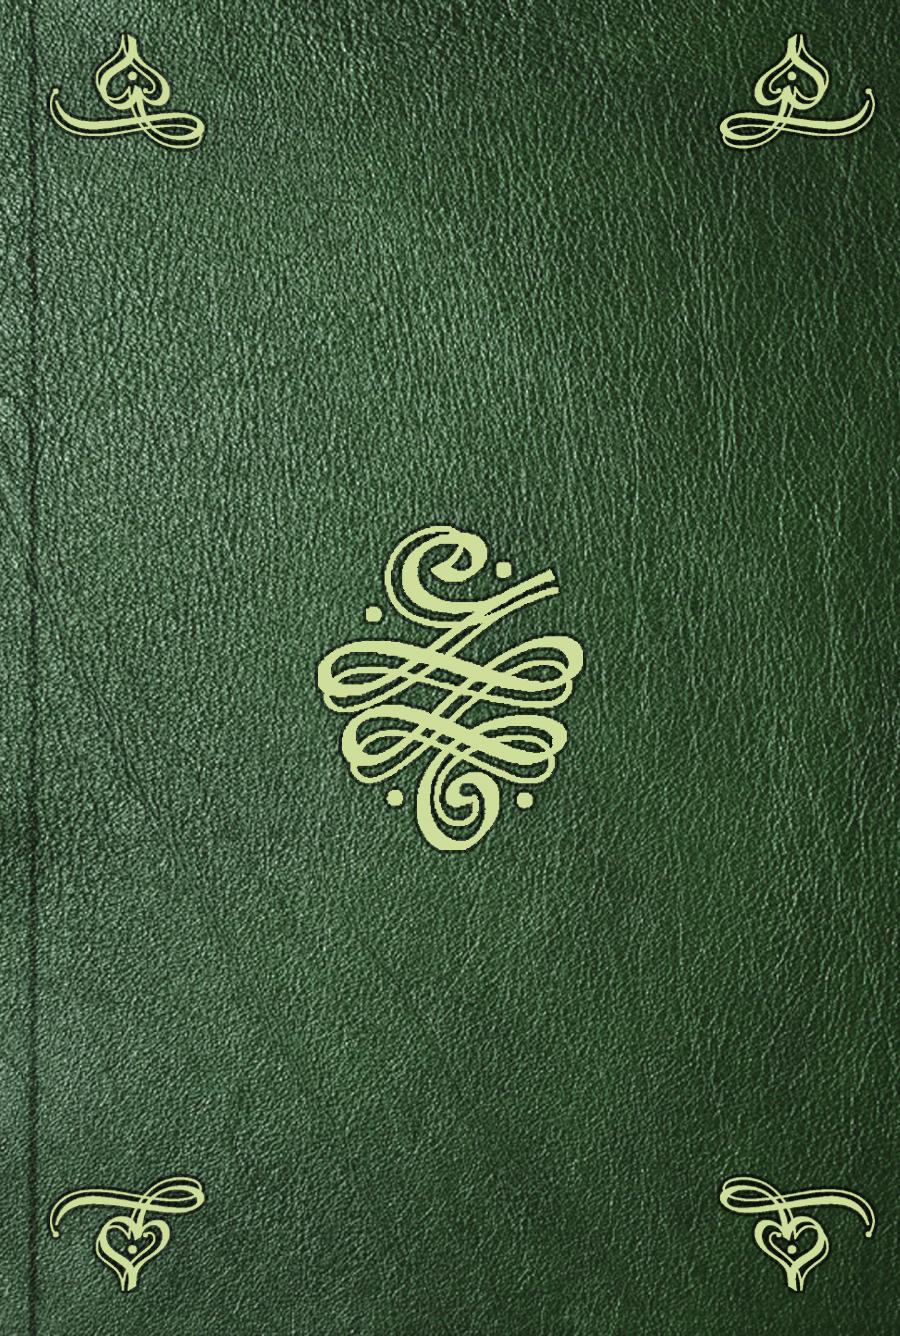 Moses Mendelssohn Phädon, oder über die Unsterblichkeit der Seele moses mendelssohn phädon oder über die unsterblichkeit der seele